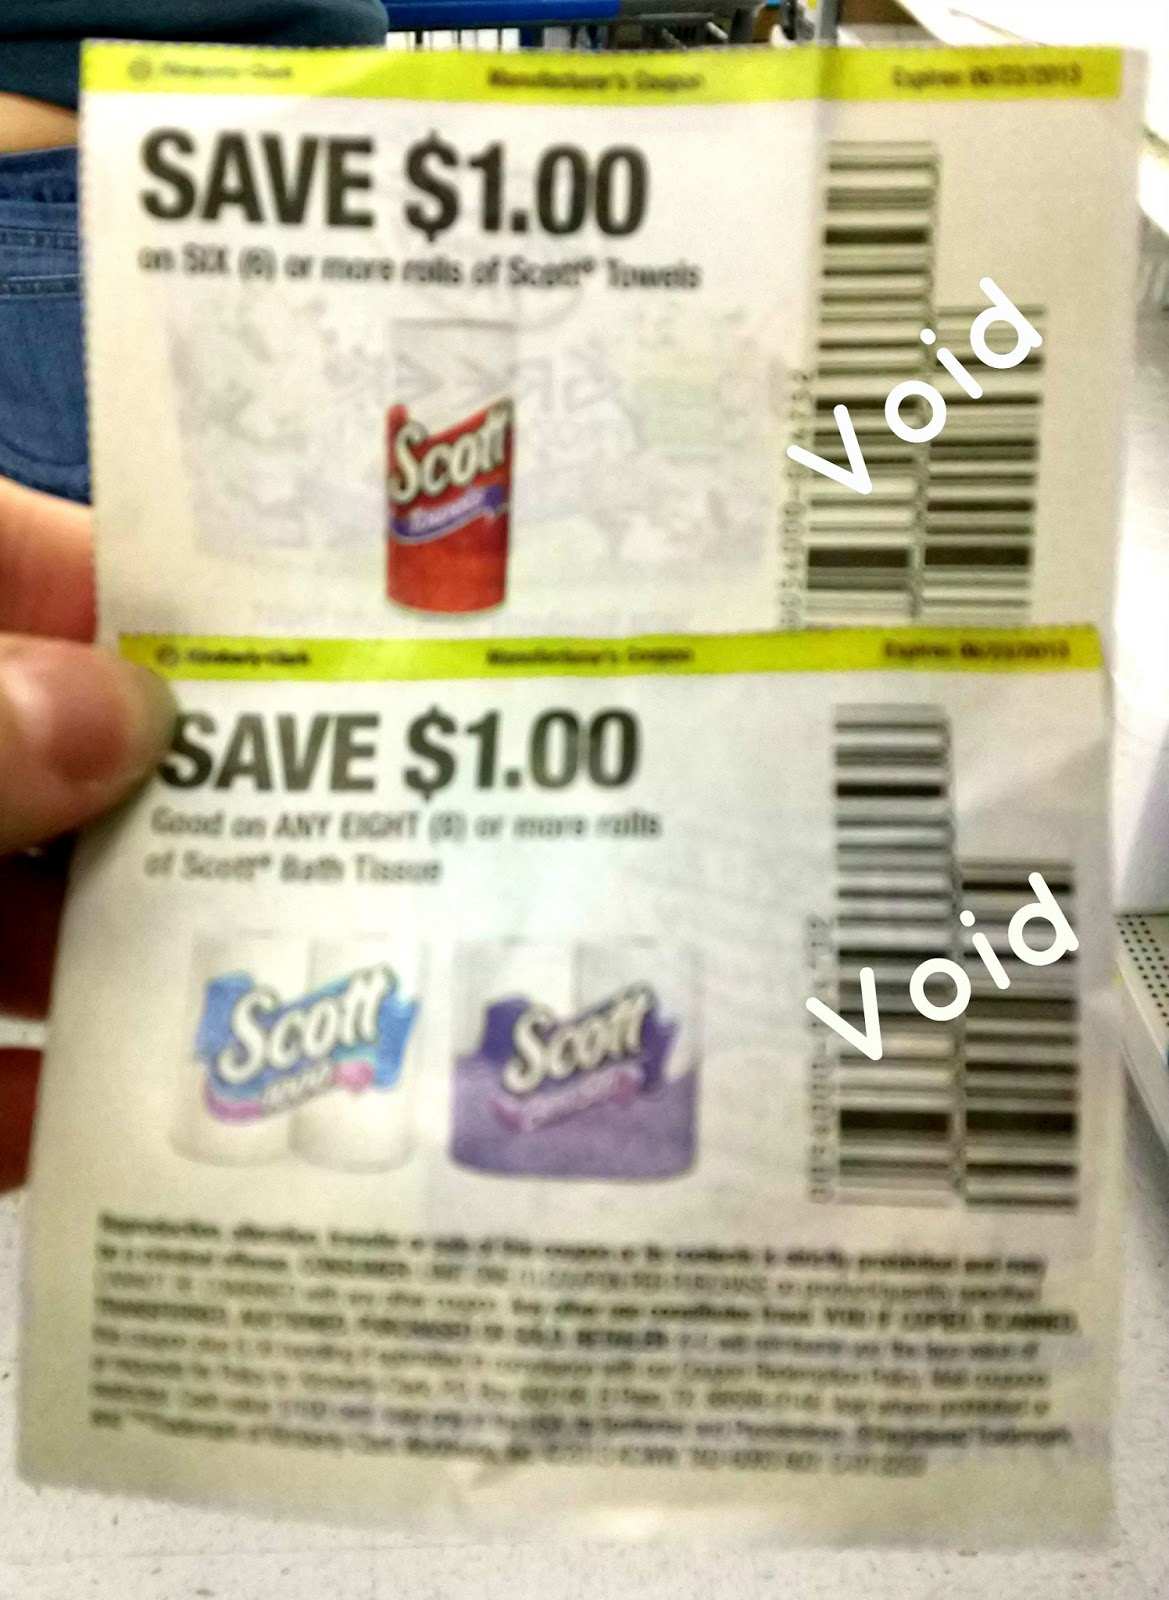 Scott shared values little mermaid coupon